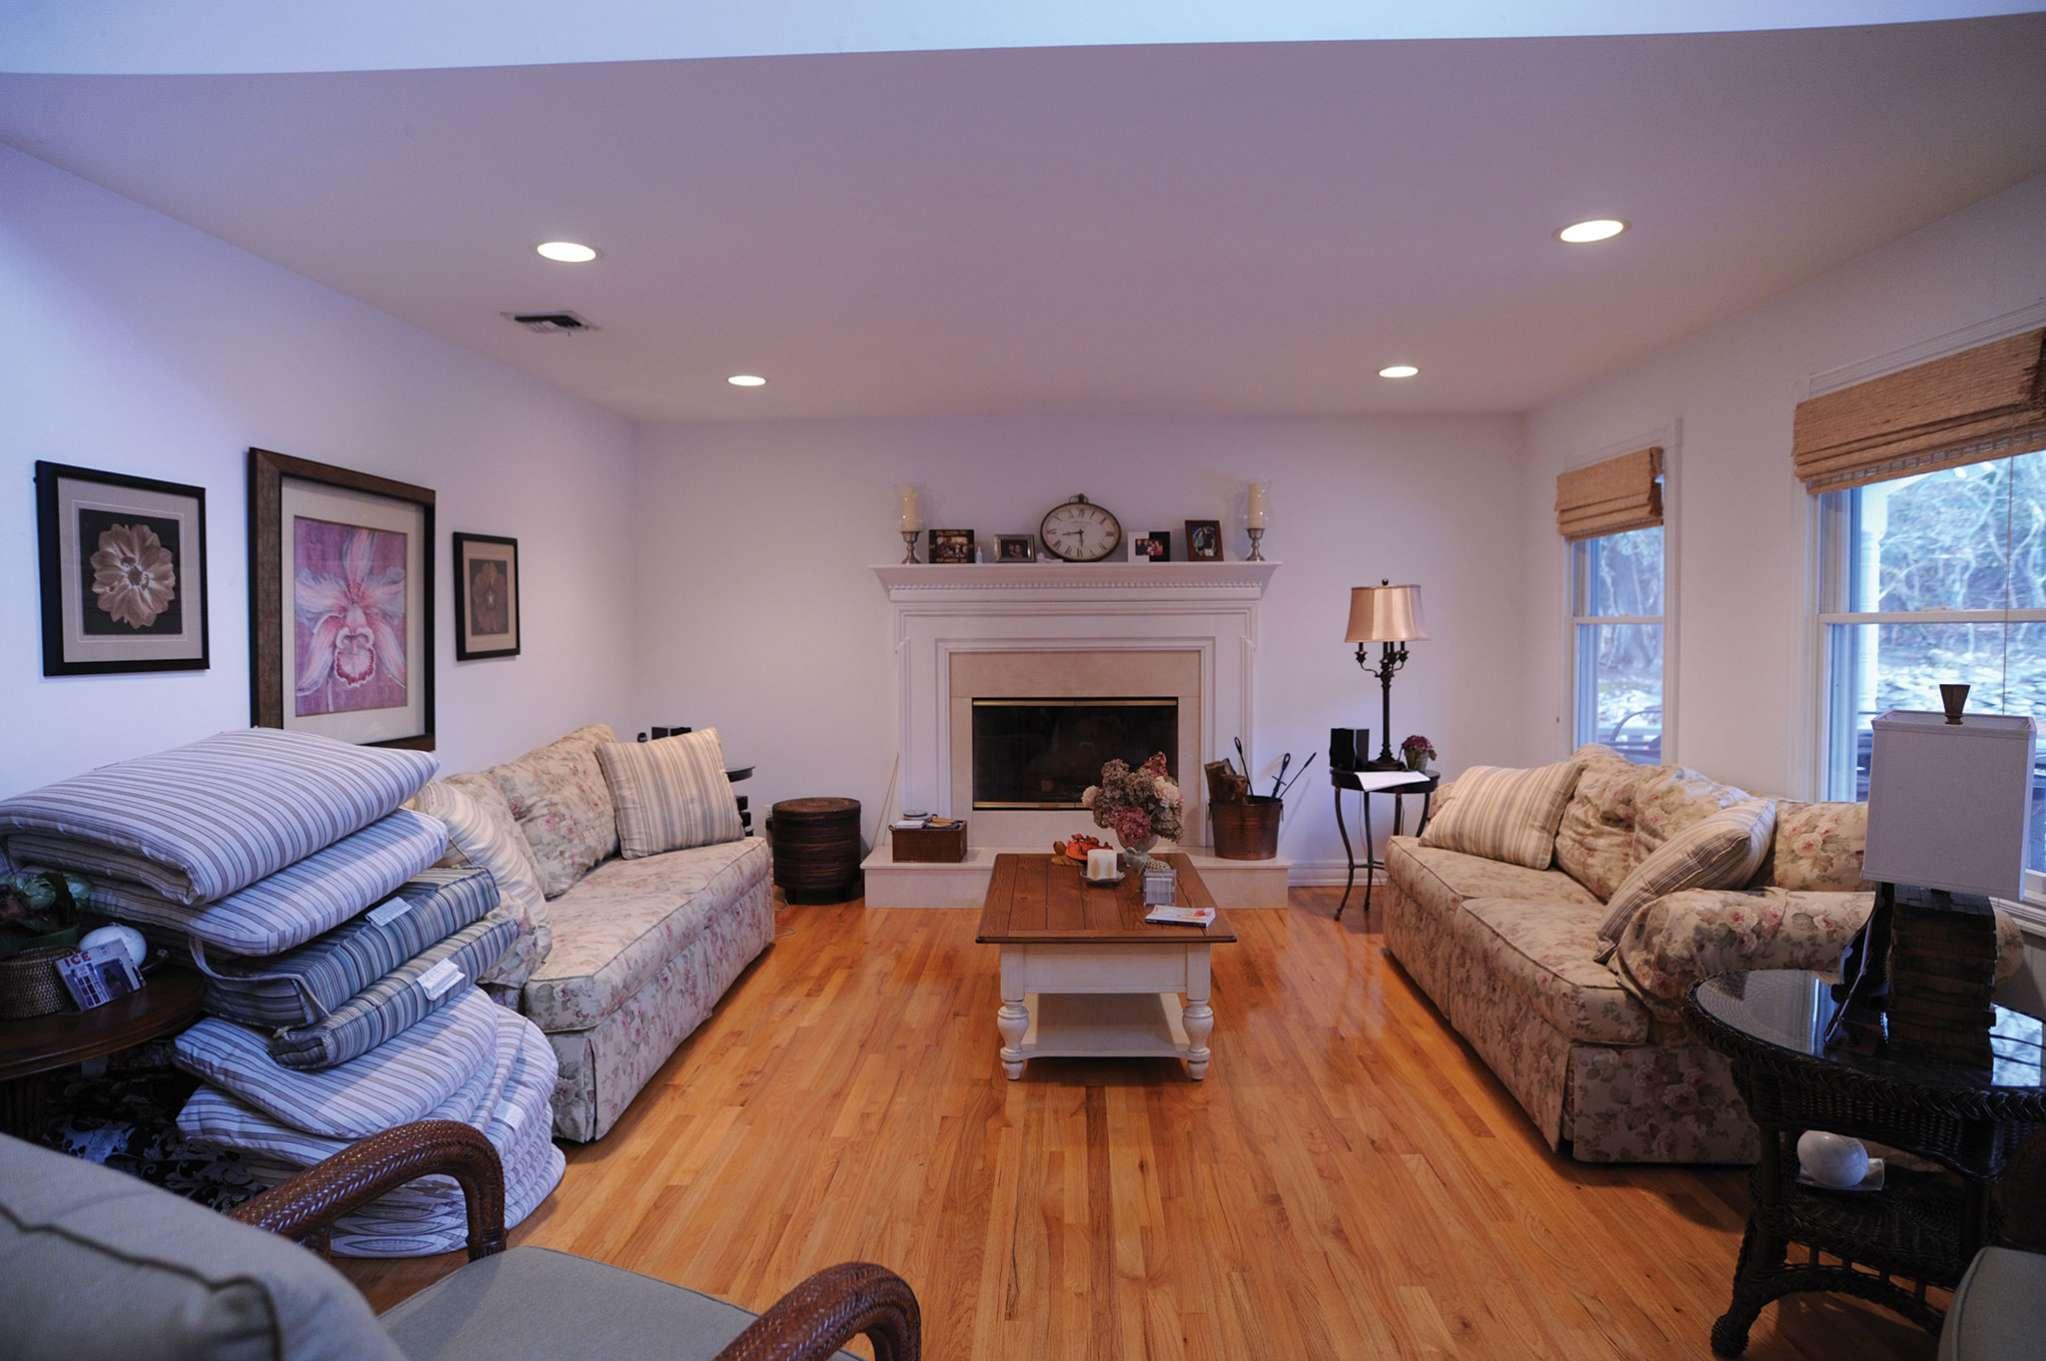 Additional photo for property listing at Bridgehampton With Tennis, Pool, Basketball, All The Toys  Bridgehampton, Nueva York